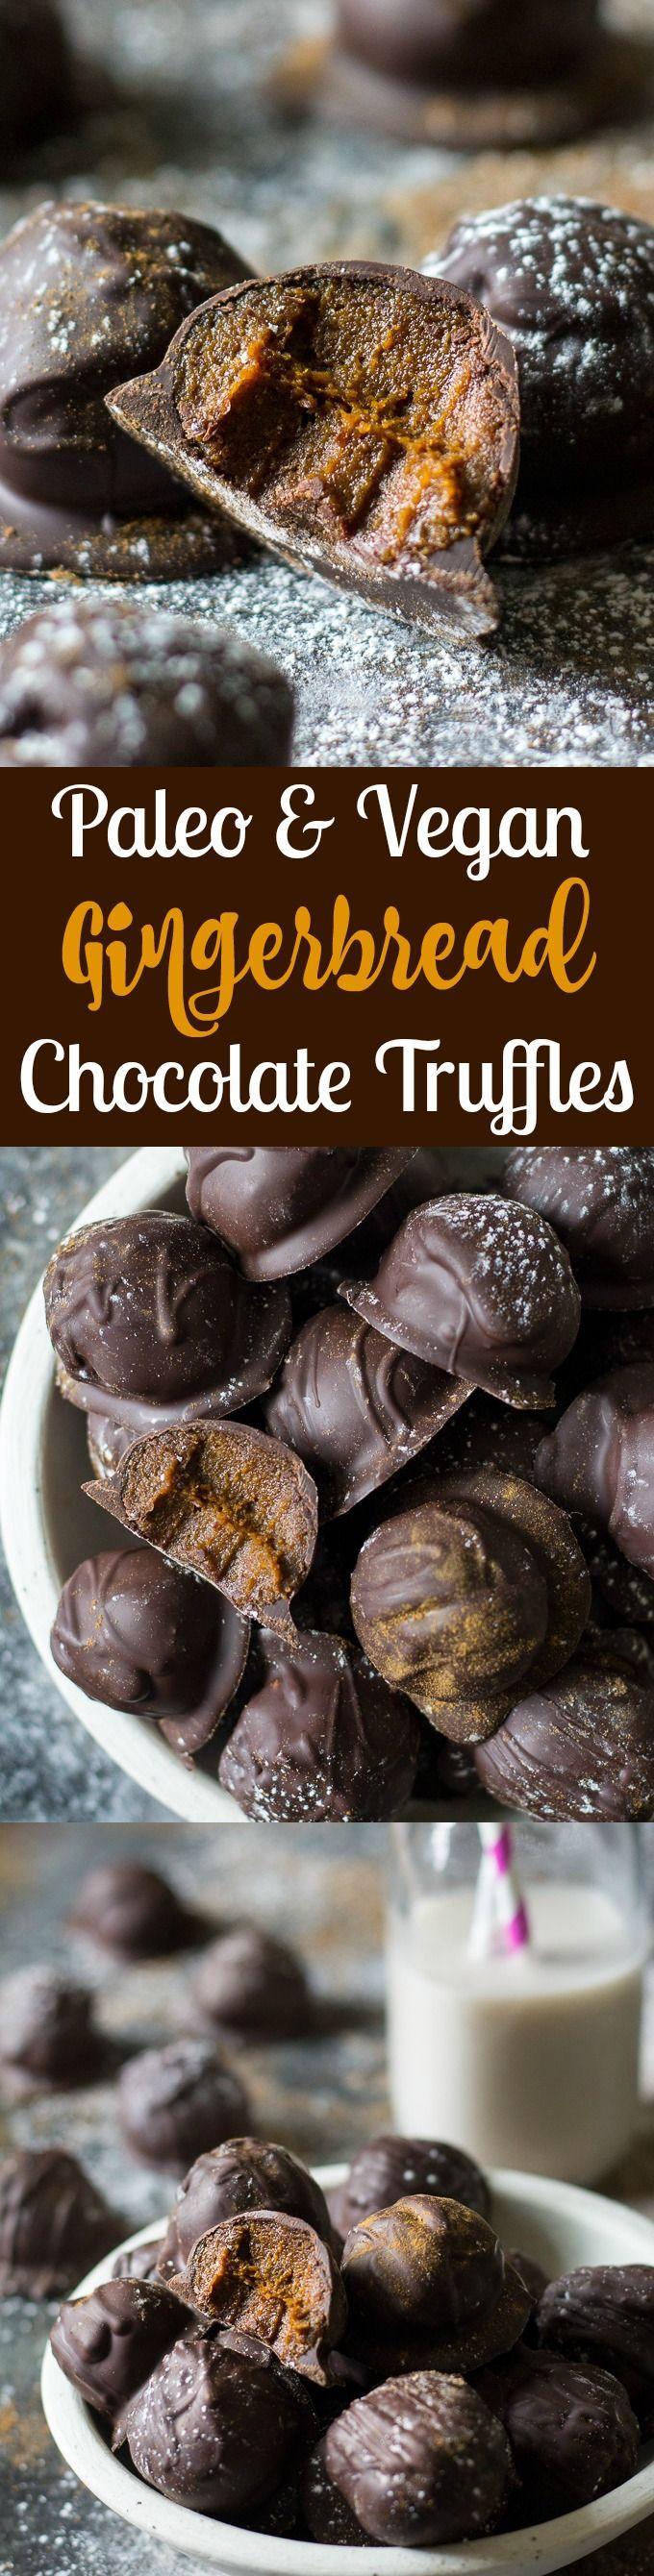 Gingerbread Chocolate Truffles - paleo and vegan